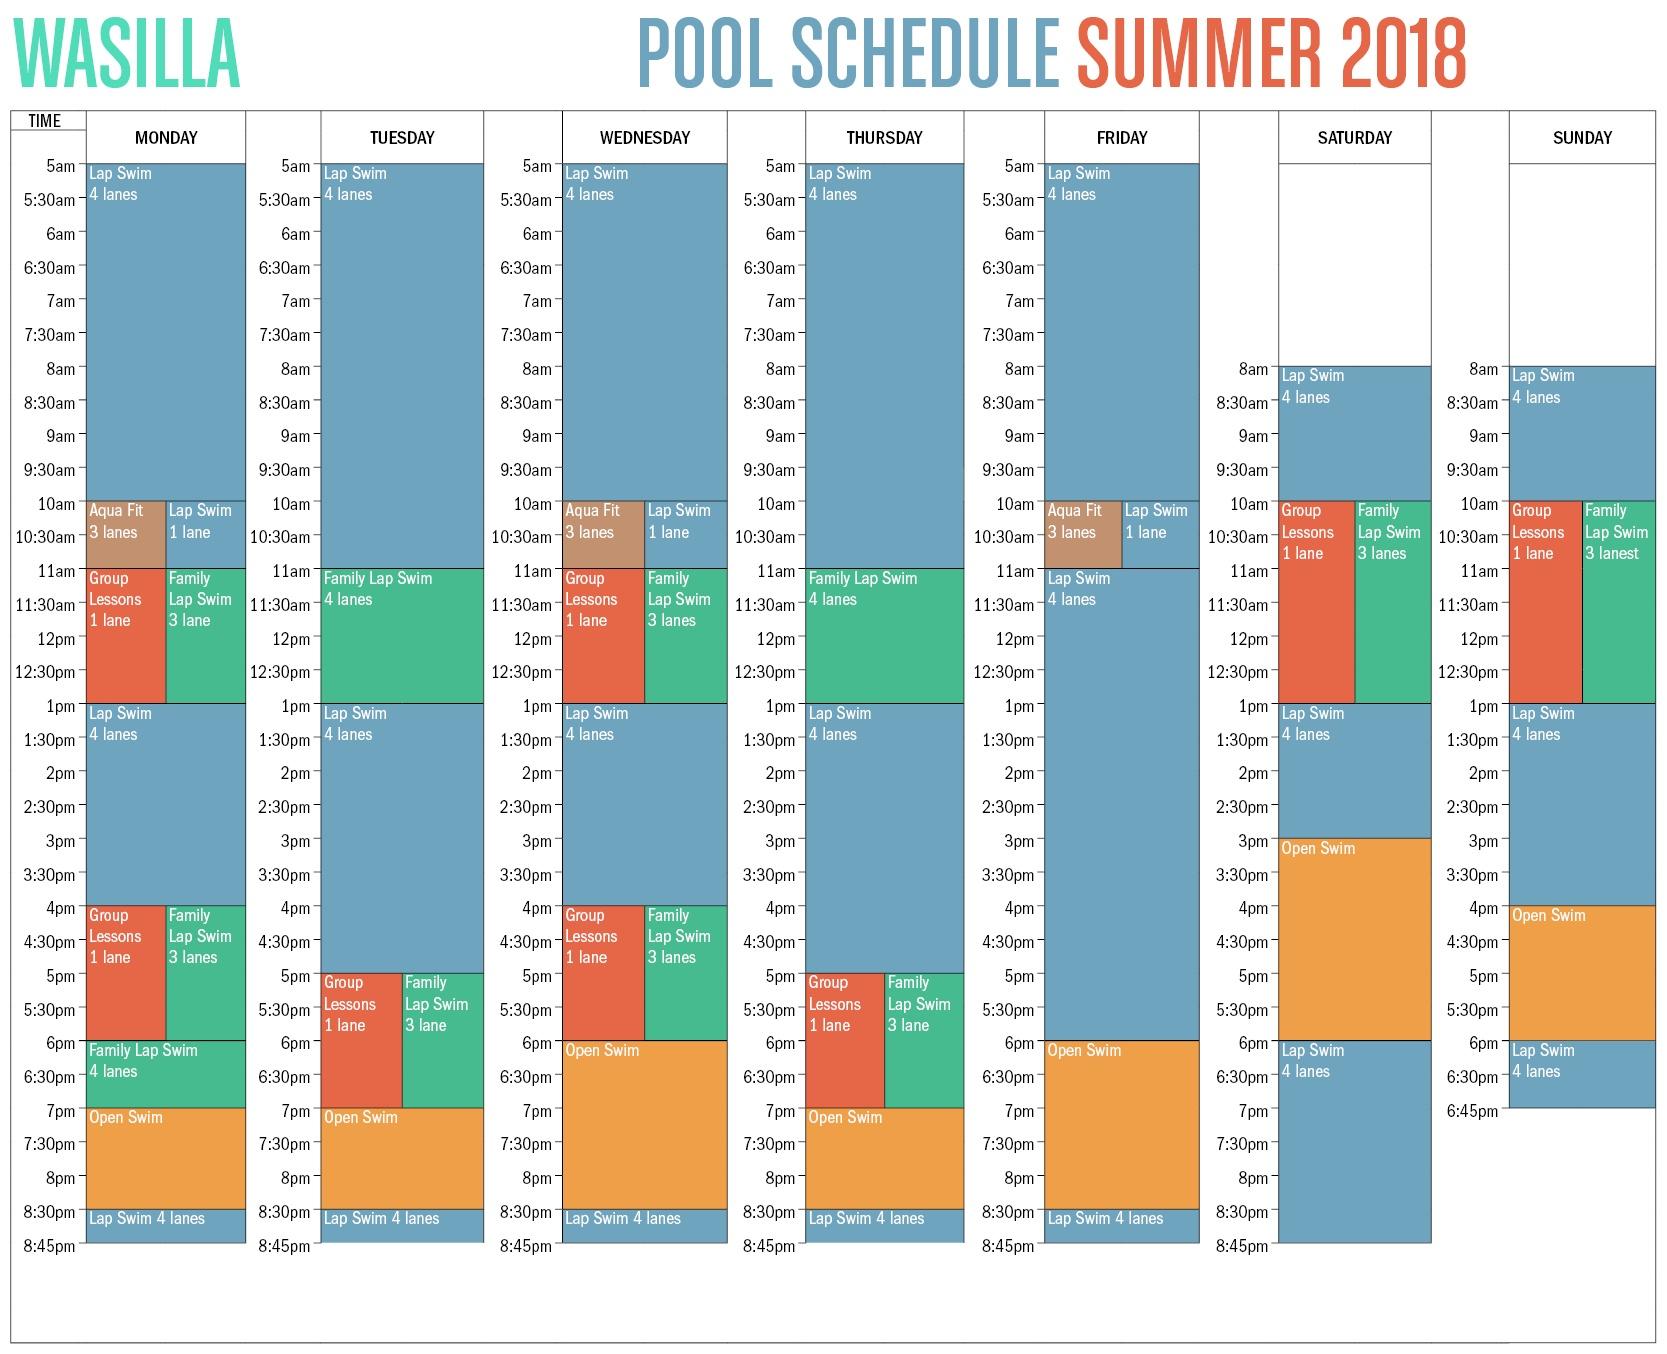 2018 Wasilla Pool Schedule